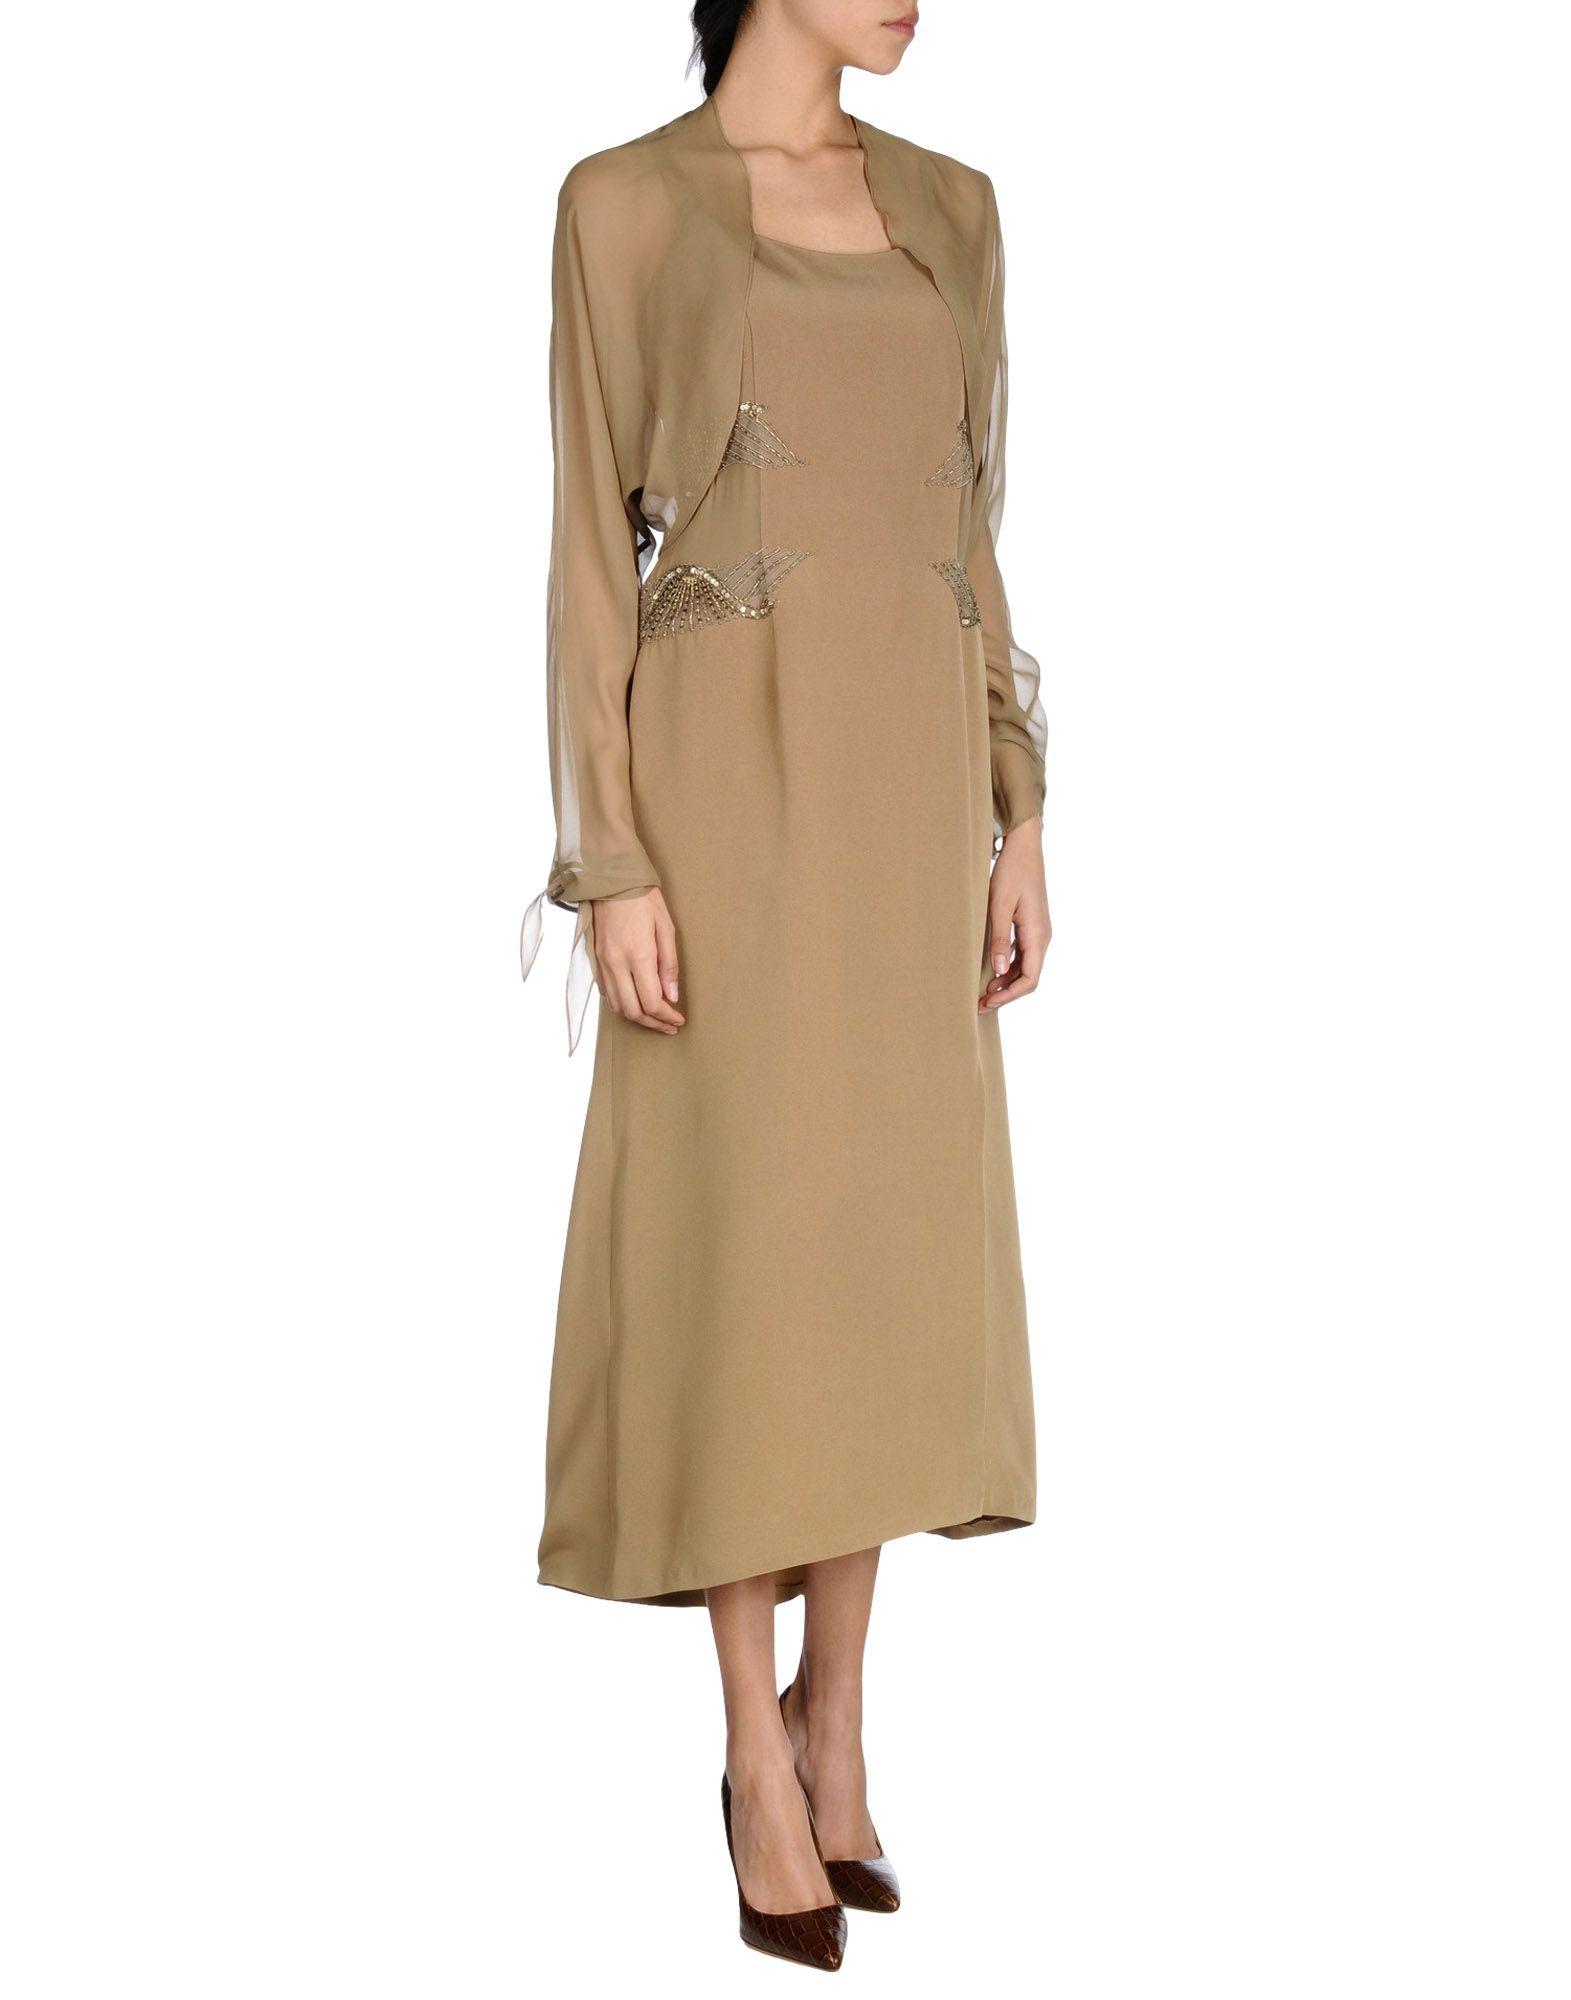 INTELLIGERE MODA Платье длиной 3/4 lisa corti платье длиной 3 4